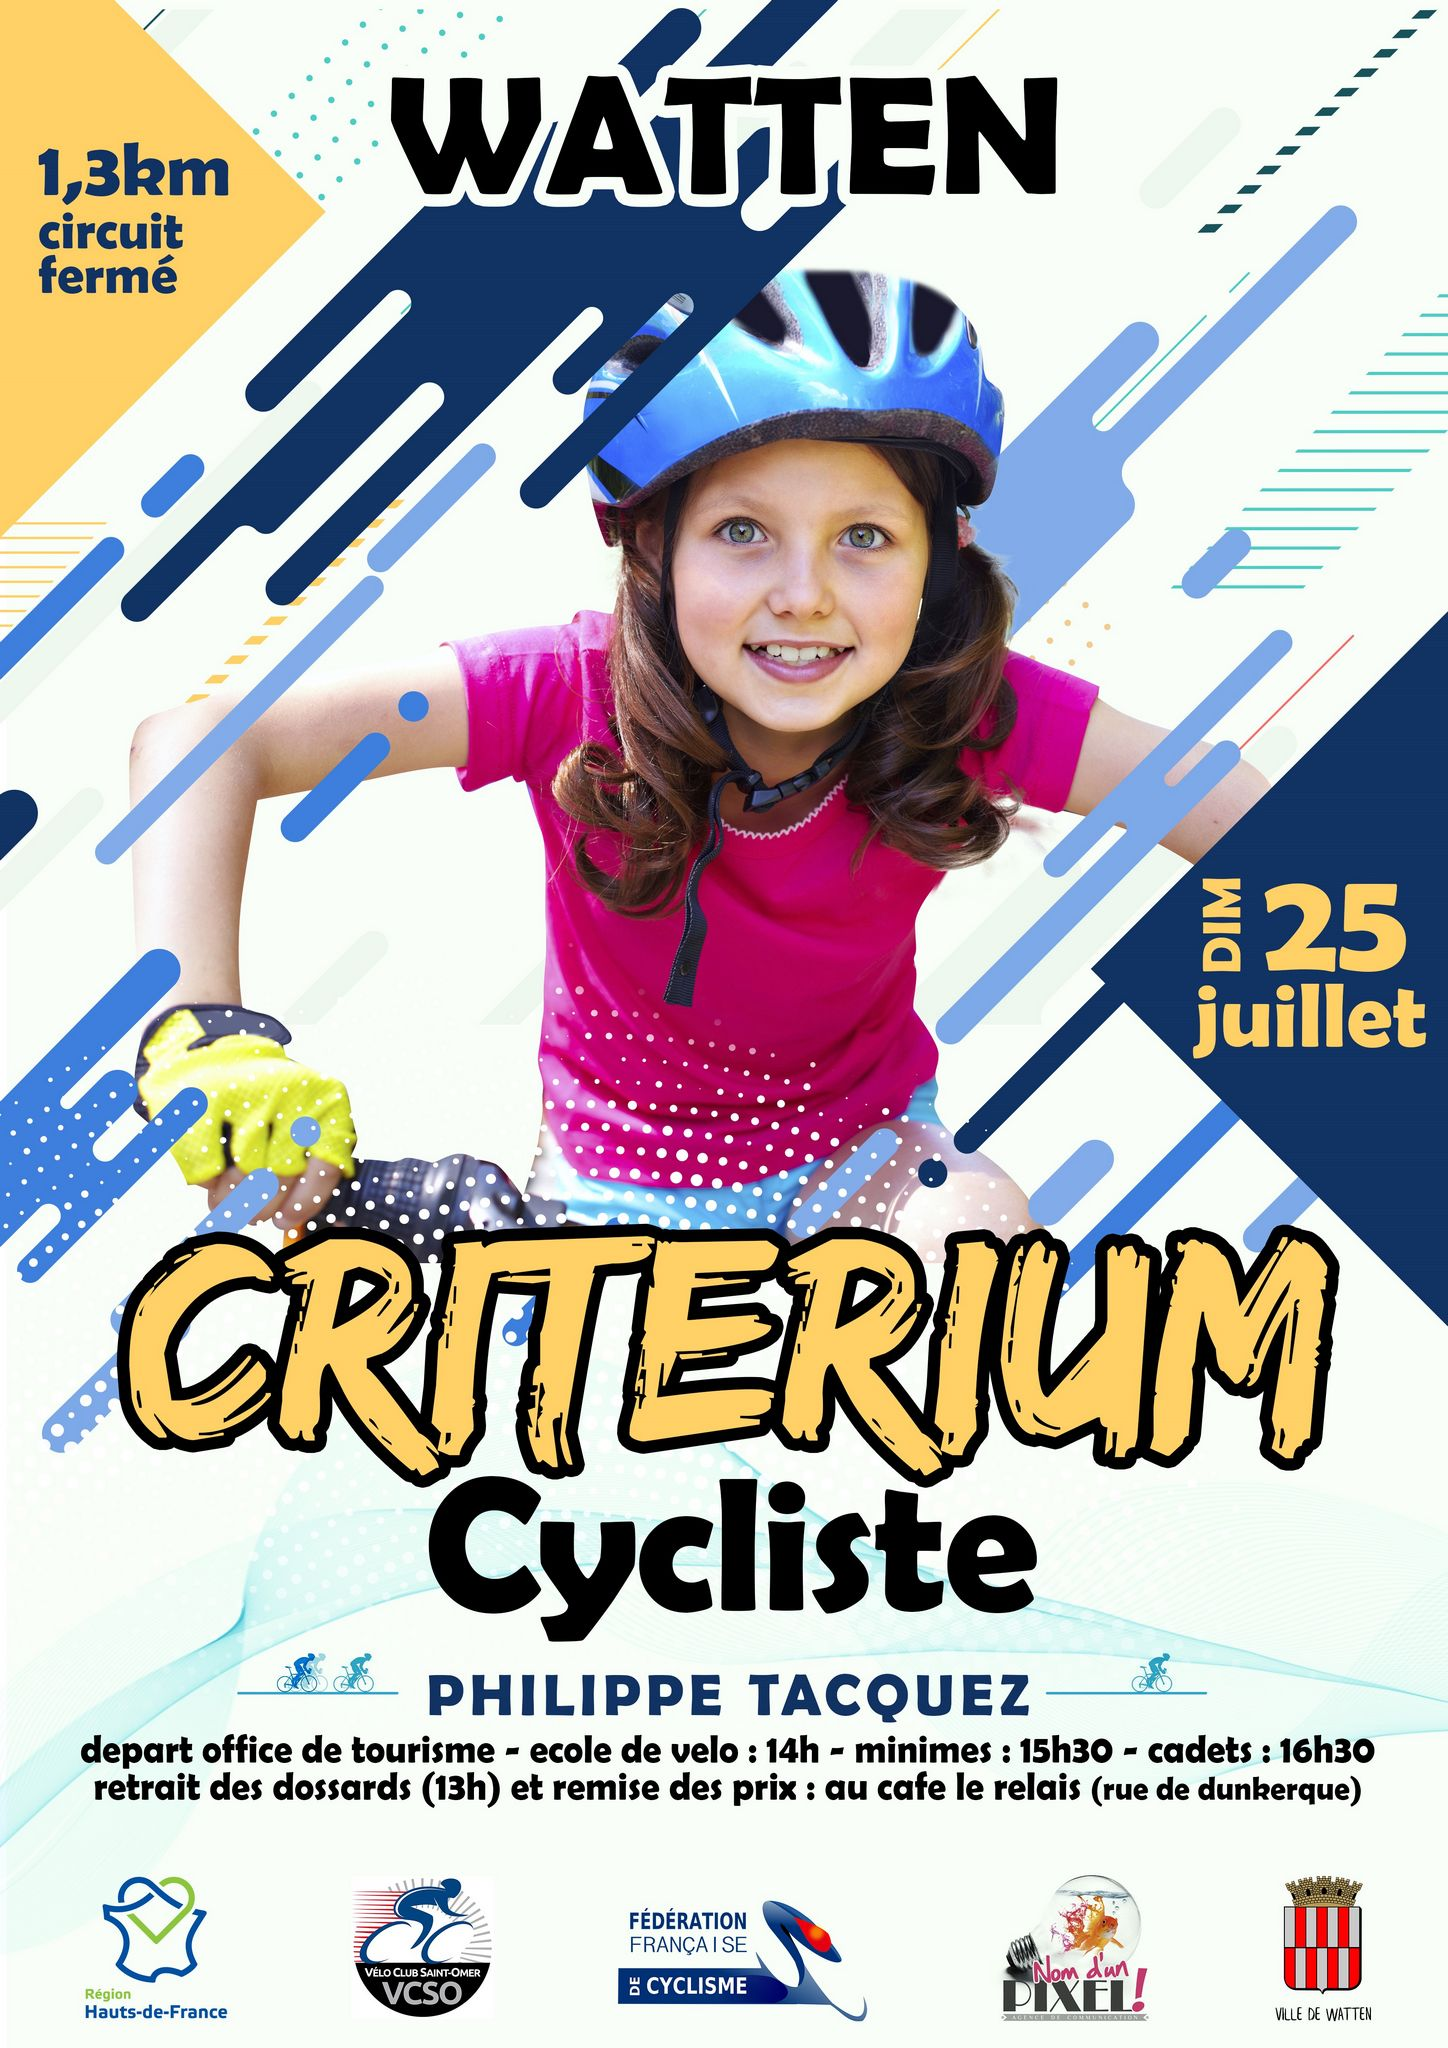 2021-07-25_criterium_cycliste_de_watten_vcso.jpg